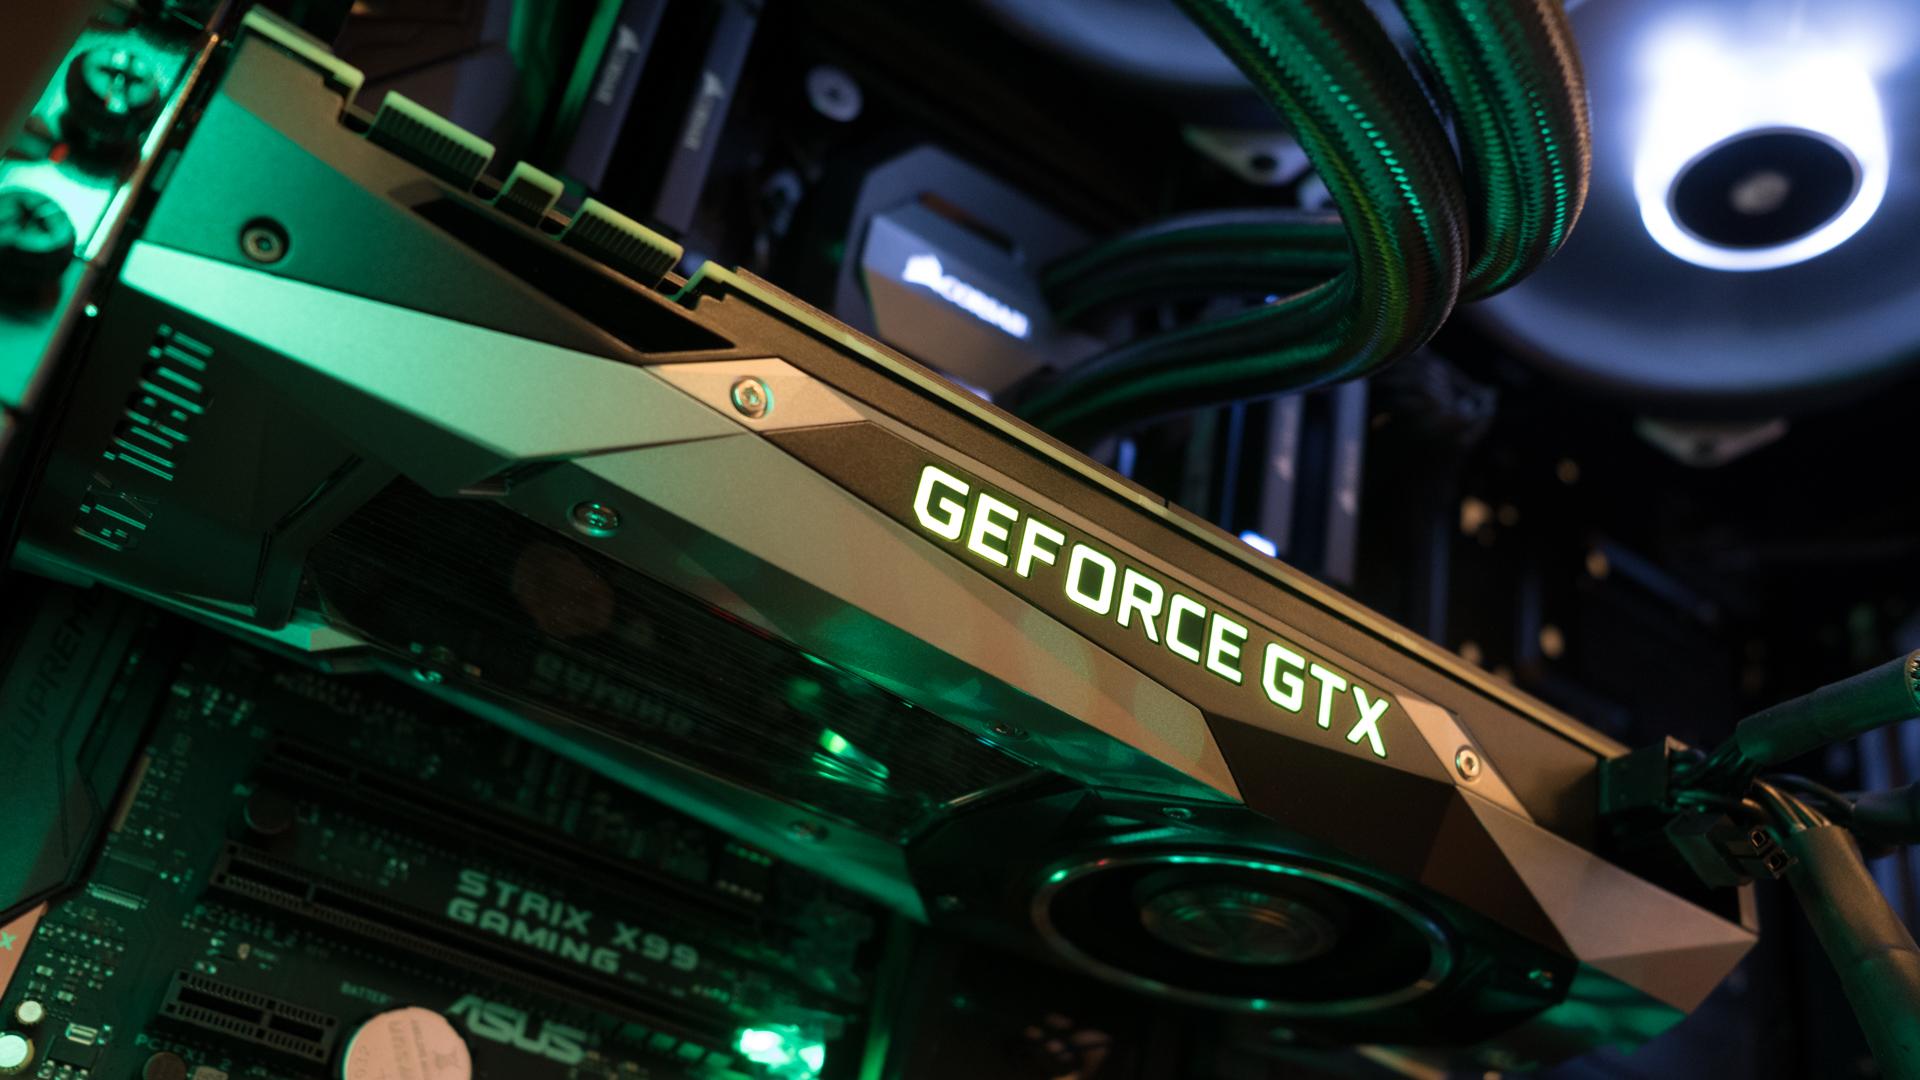 GeForce GTX 1660 Ti leak shows the graphics card